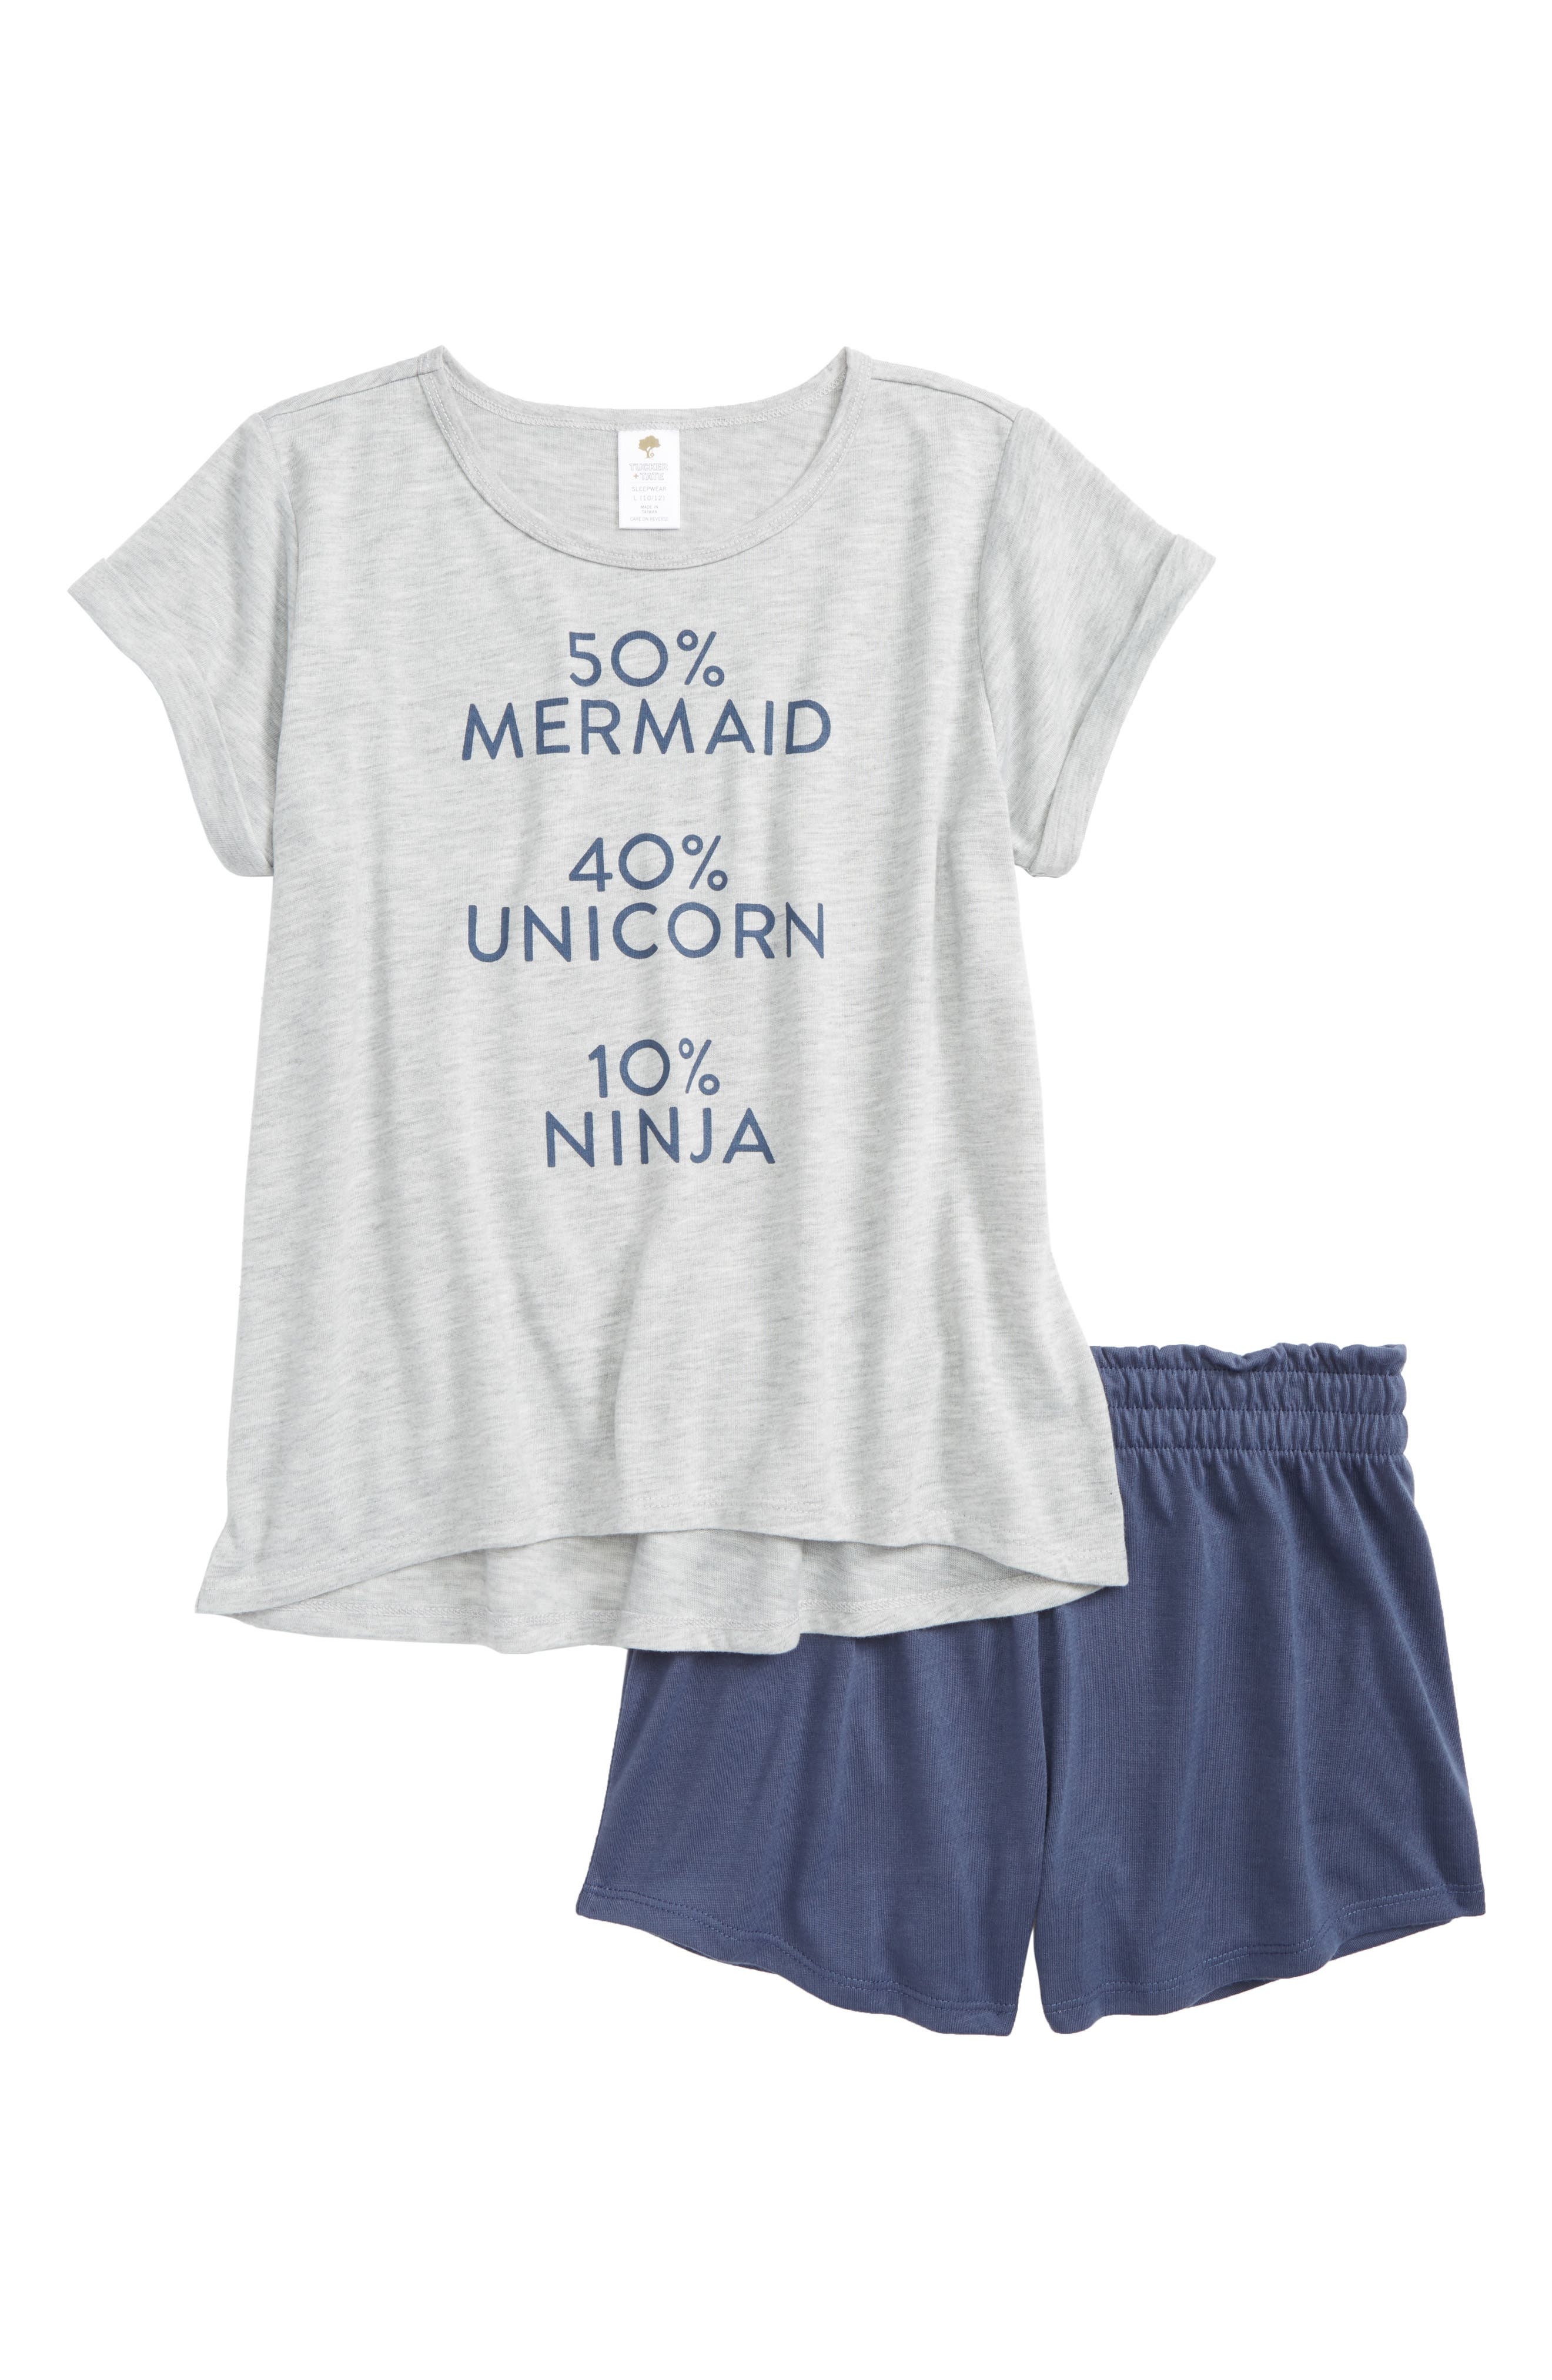 Short Pajamas,                             Main thumbnail 1, color,                             Grey Ash Heather Ninja